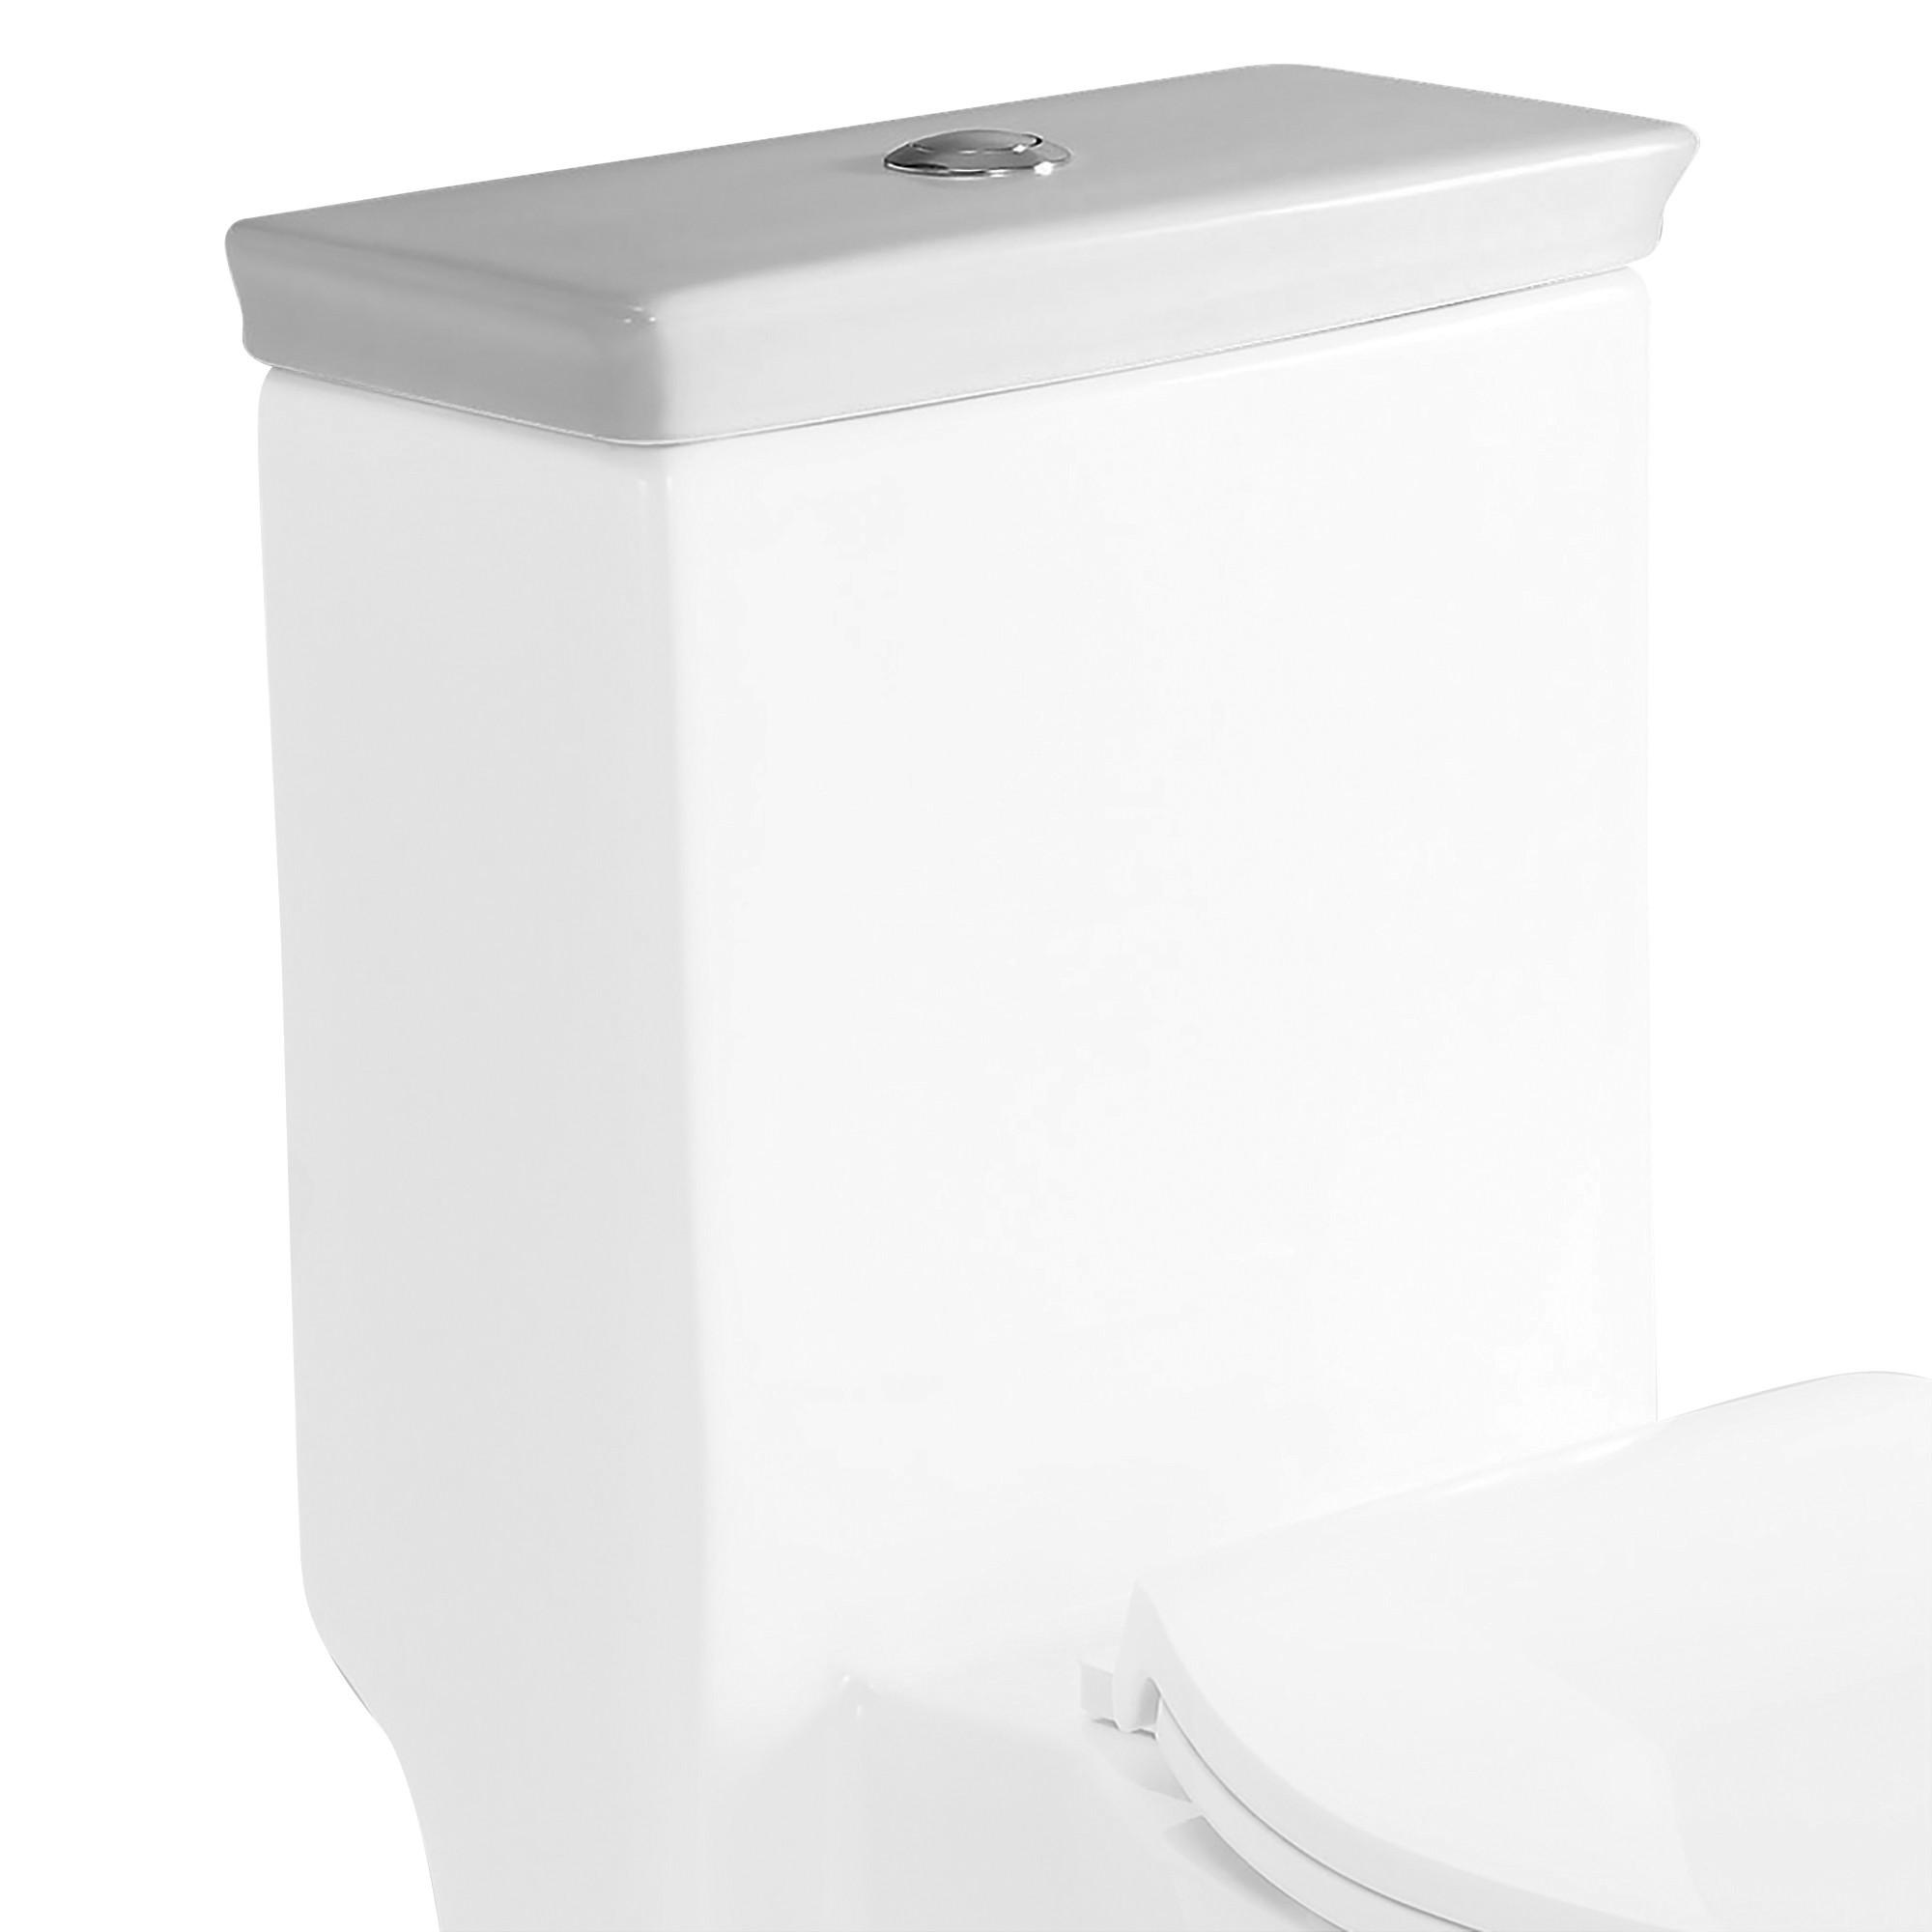 EAGO R-377LID Replacement Ceramic Toilet Lid for TB377